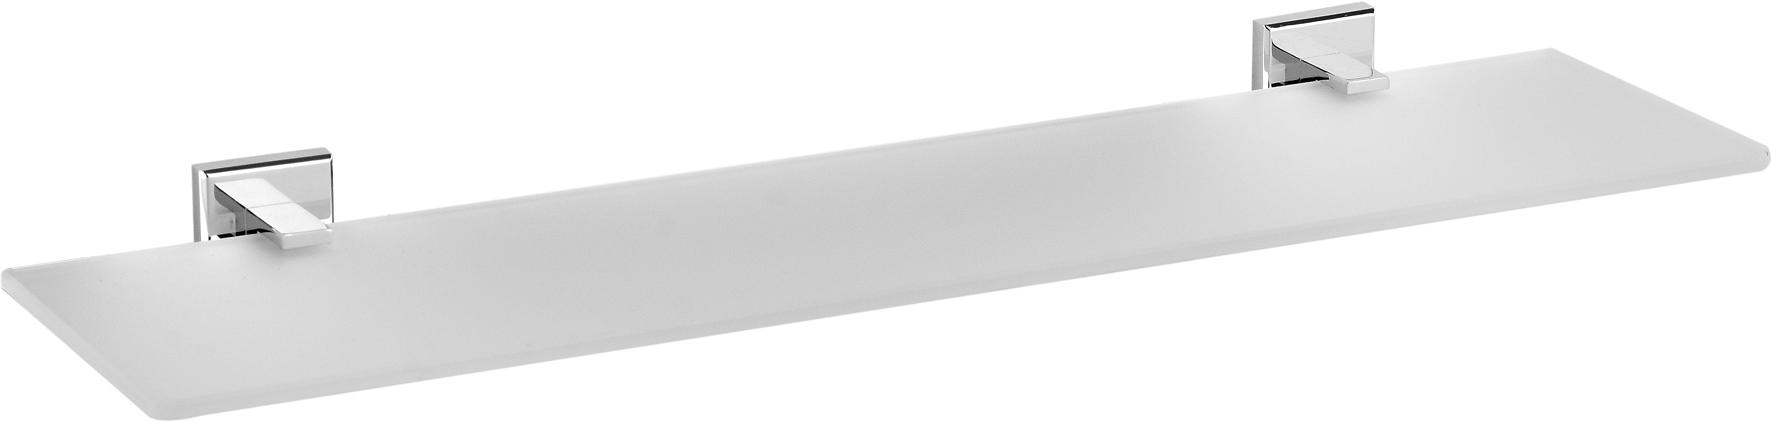 Skleněná polička 50 cm Quad Chrom